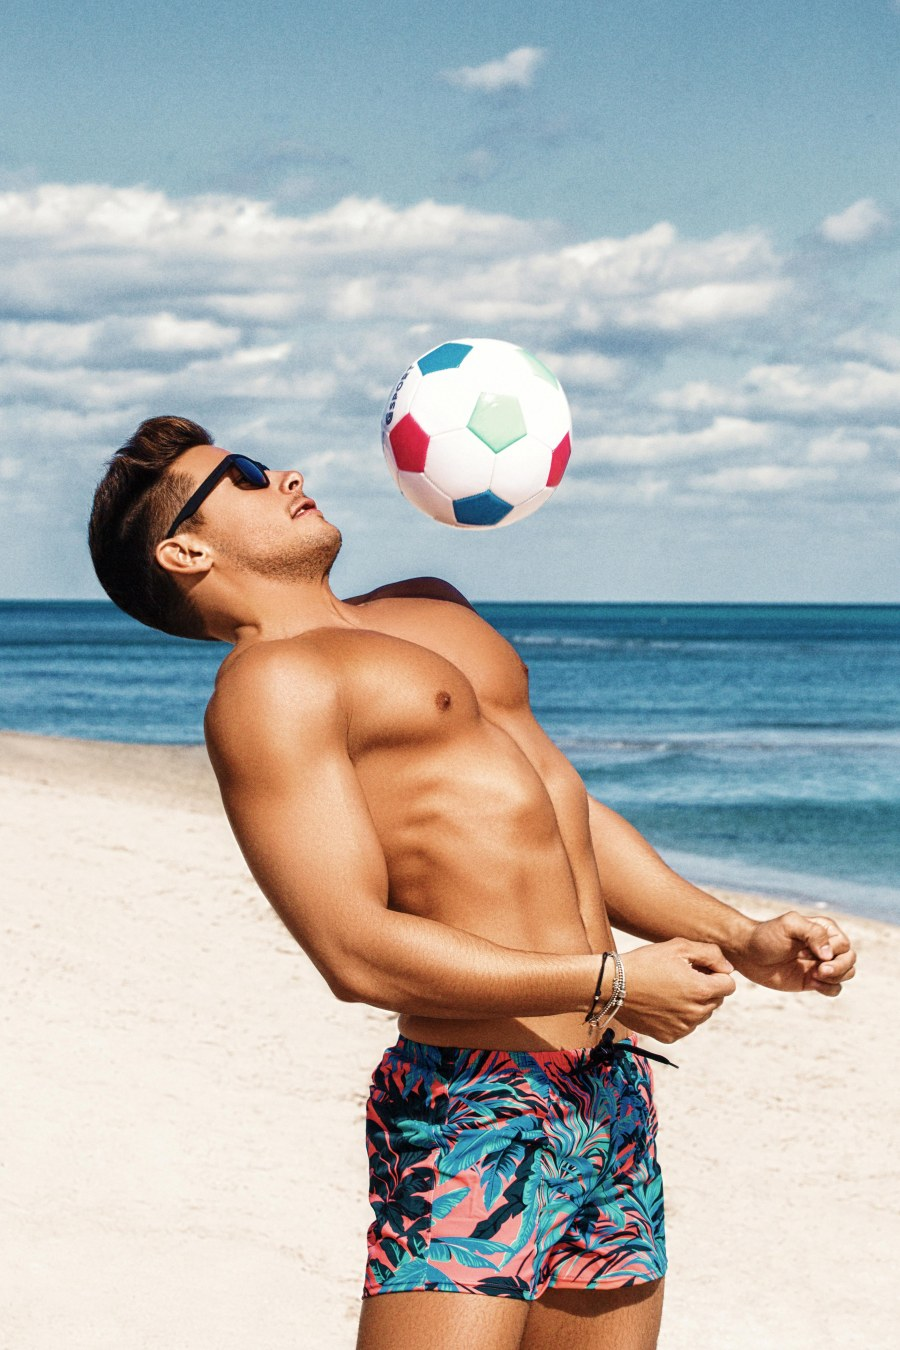 Life's A Beach - Andrea Denver @ Wilhelmina Models Miami - By Alex Jackson - 2